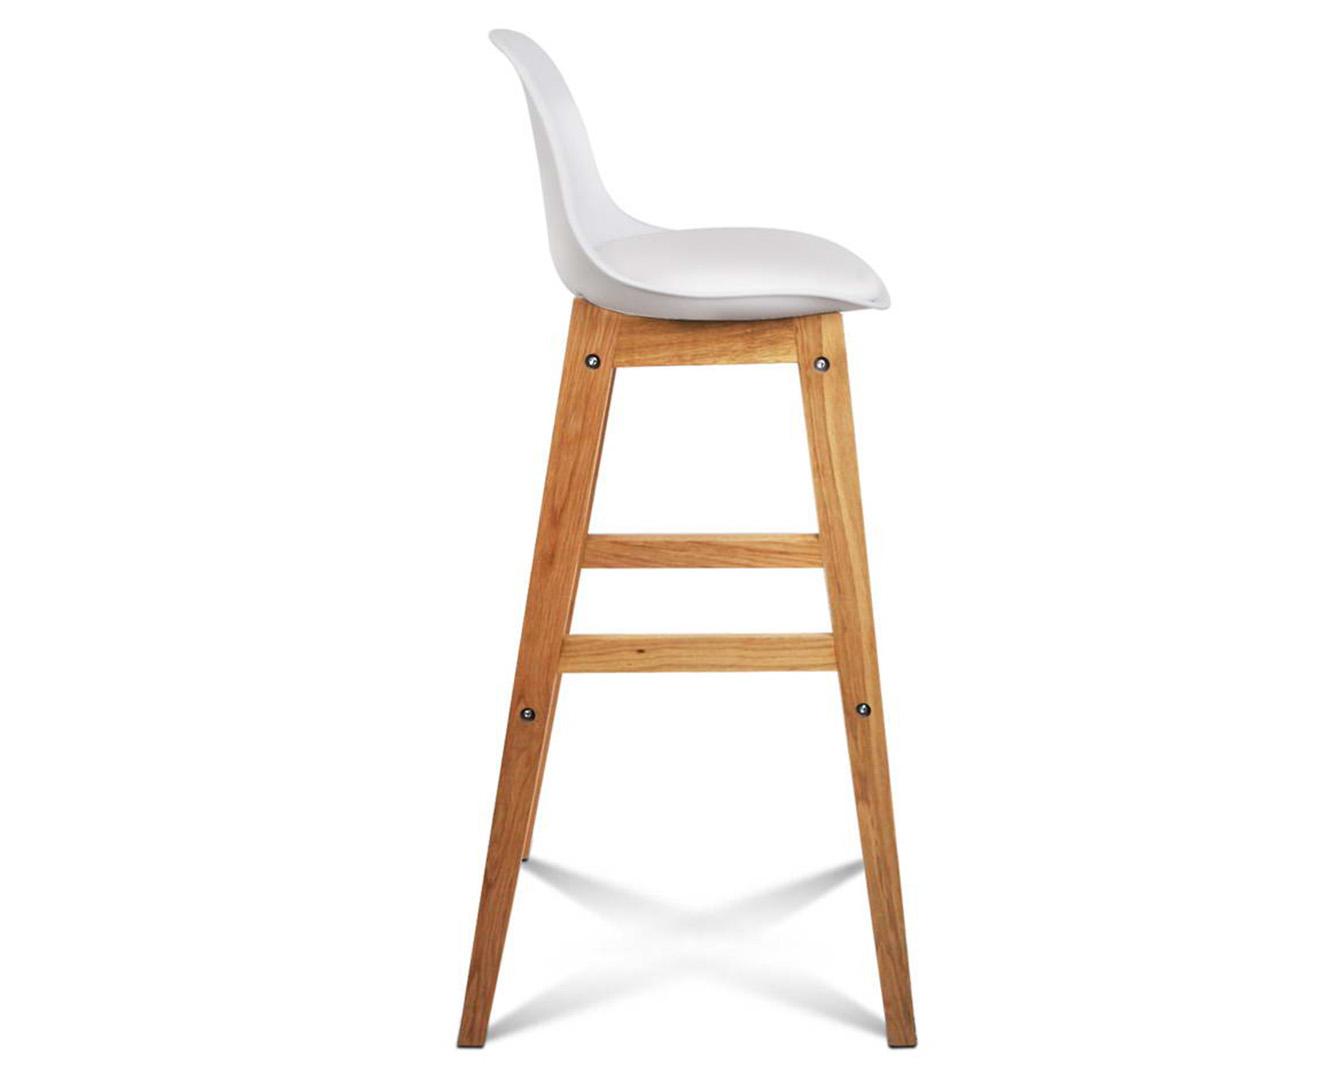 White Wood Bar Stools With Backs ~ Scoopon shopping set of eames high back bar stools